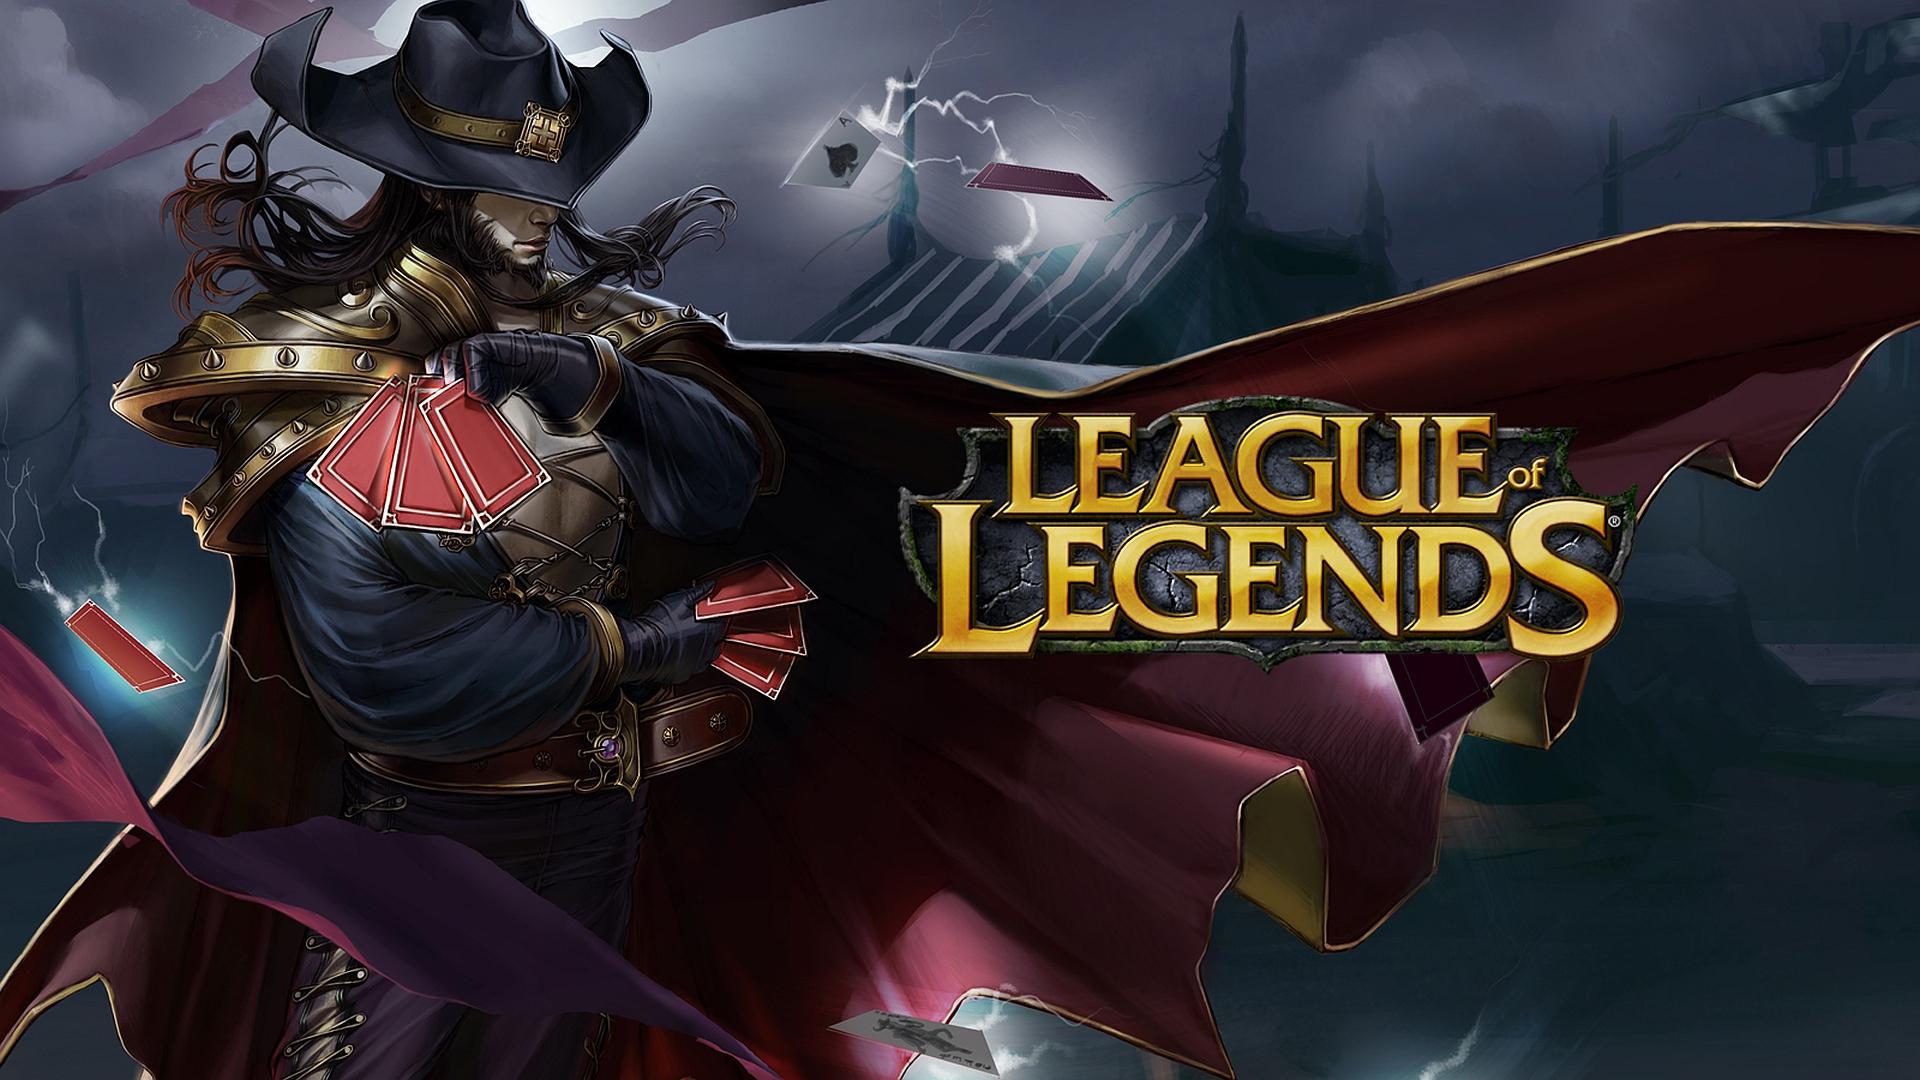 League of Legends wallpaper 65